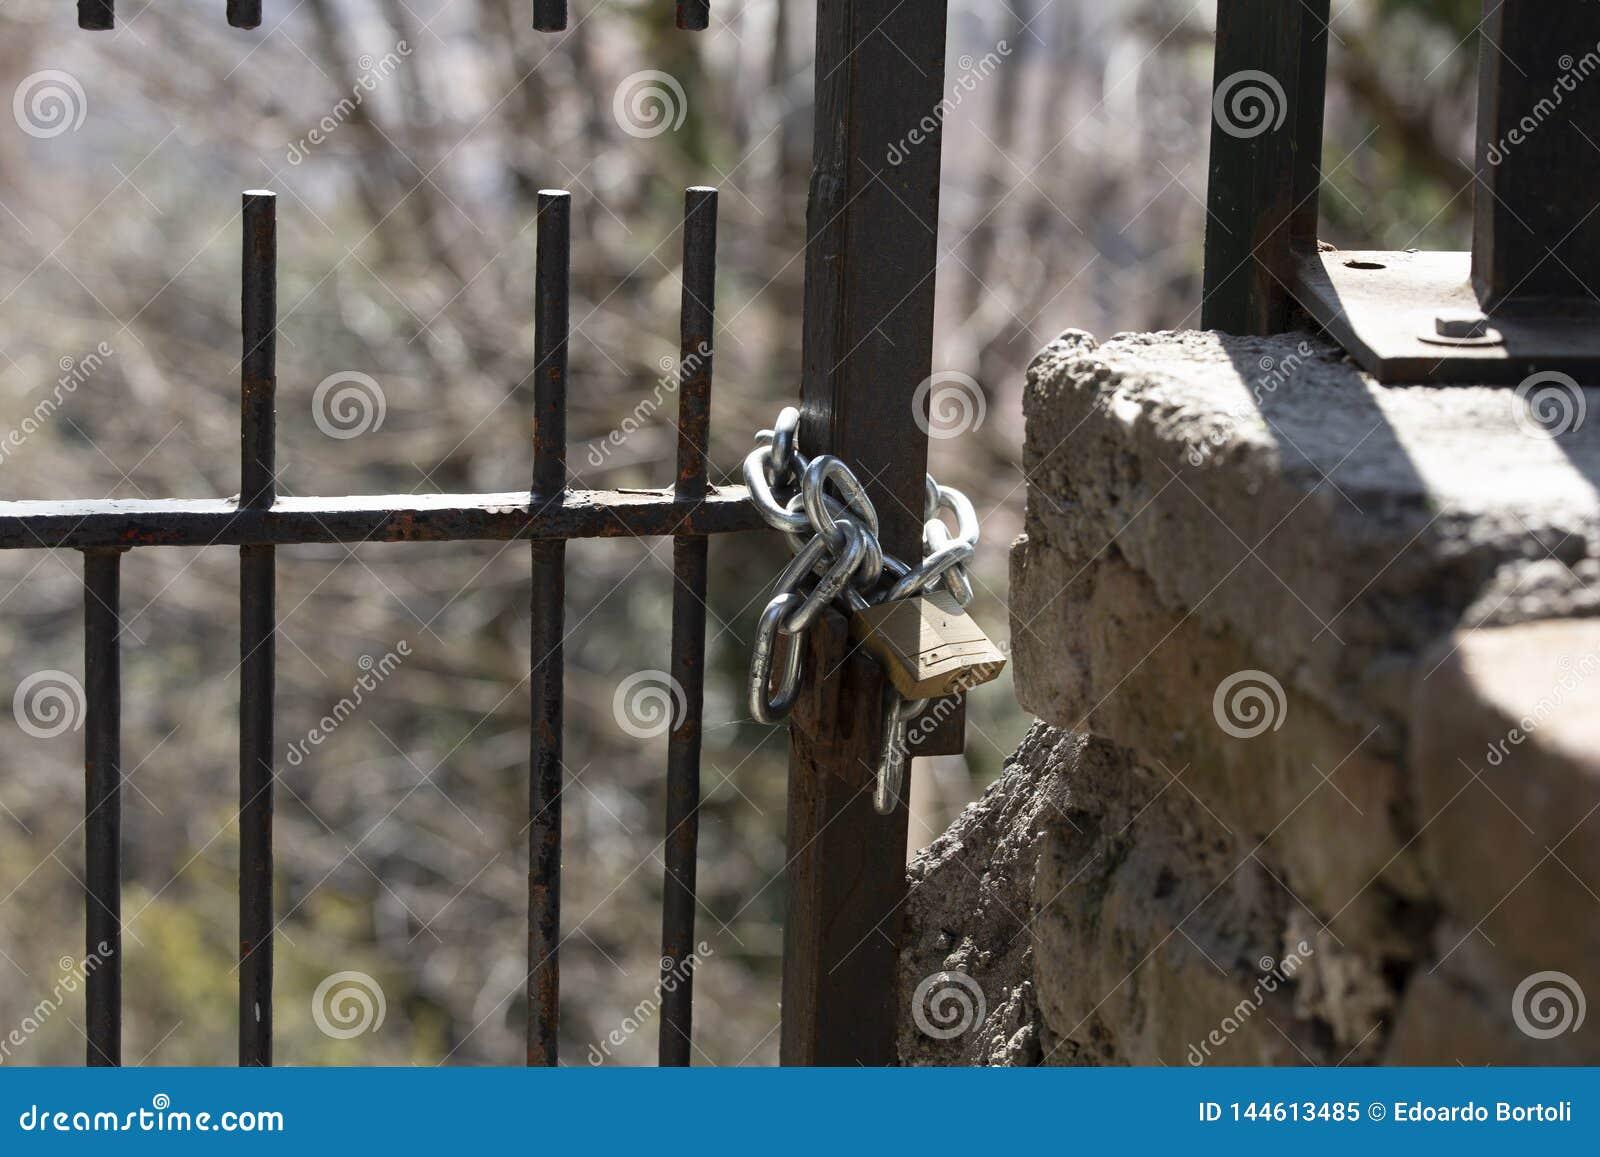 Zamknięta kłódka z łańcuchem